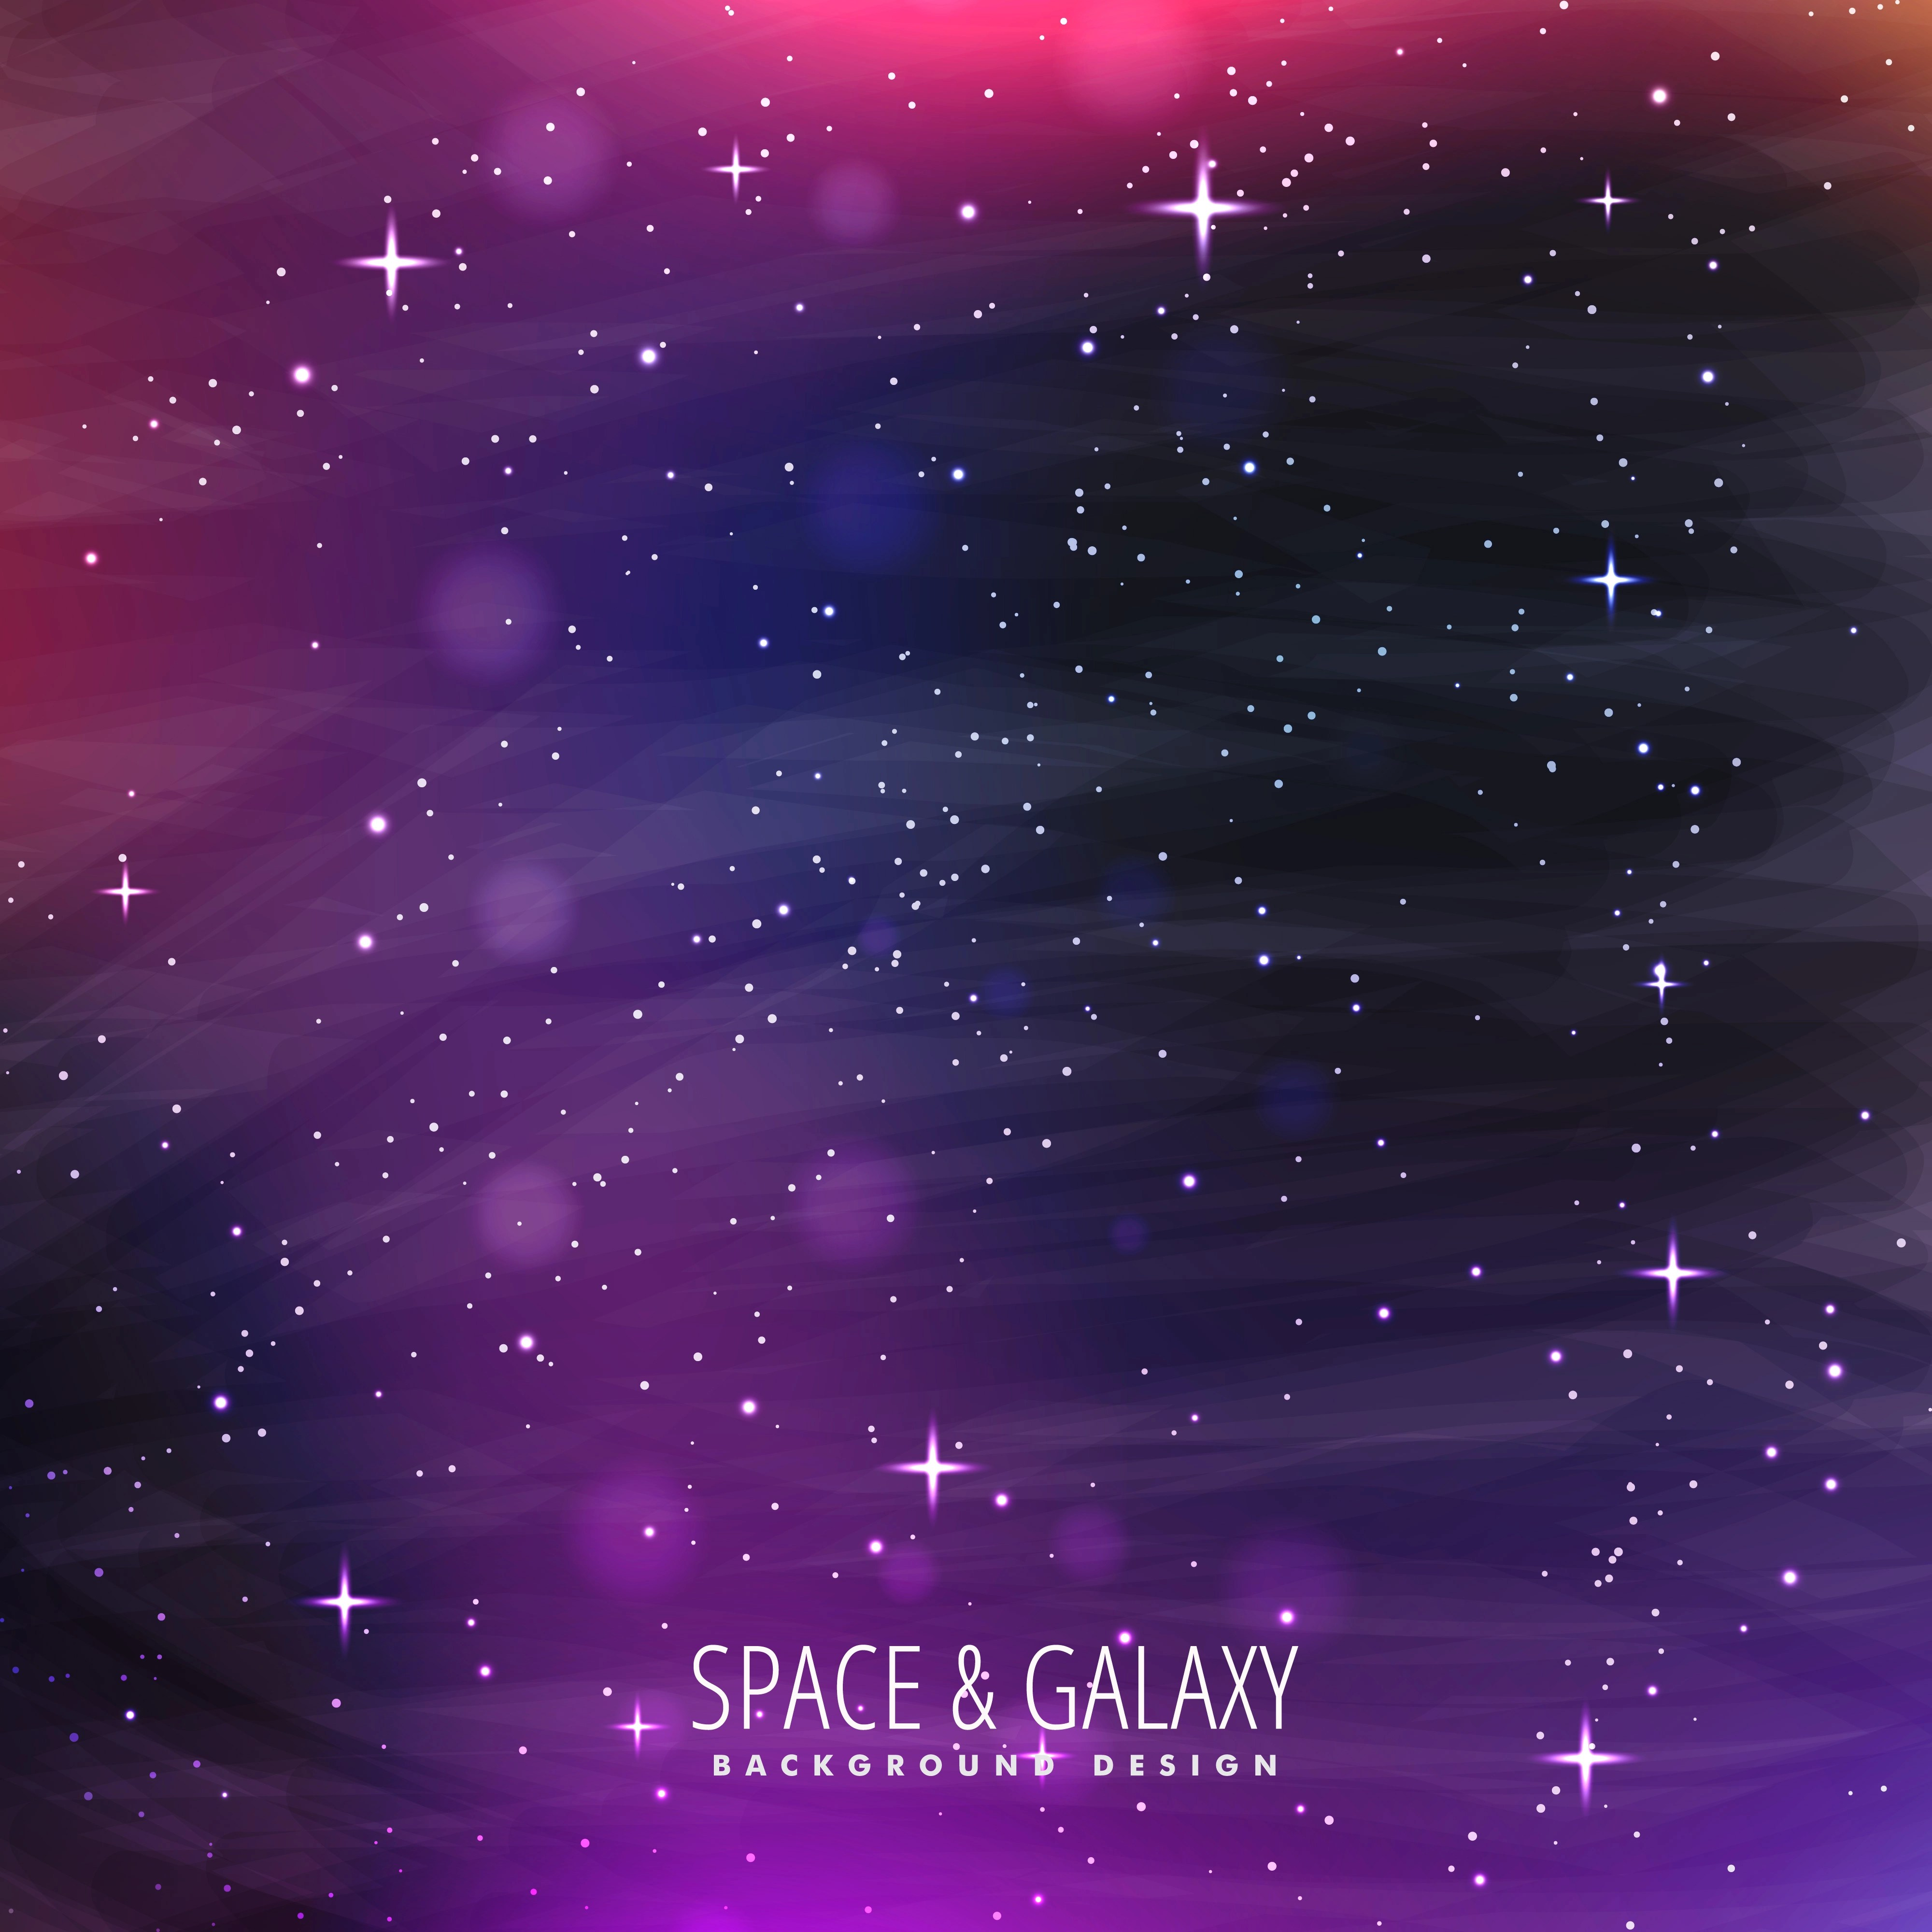 Samsung Galaxy S7 Edge Fall Wallpaper Galaxy Background Design Download Free Vector Art Stock